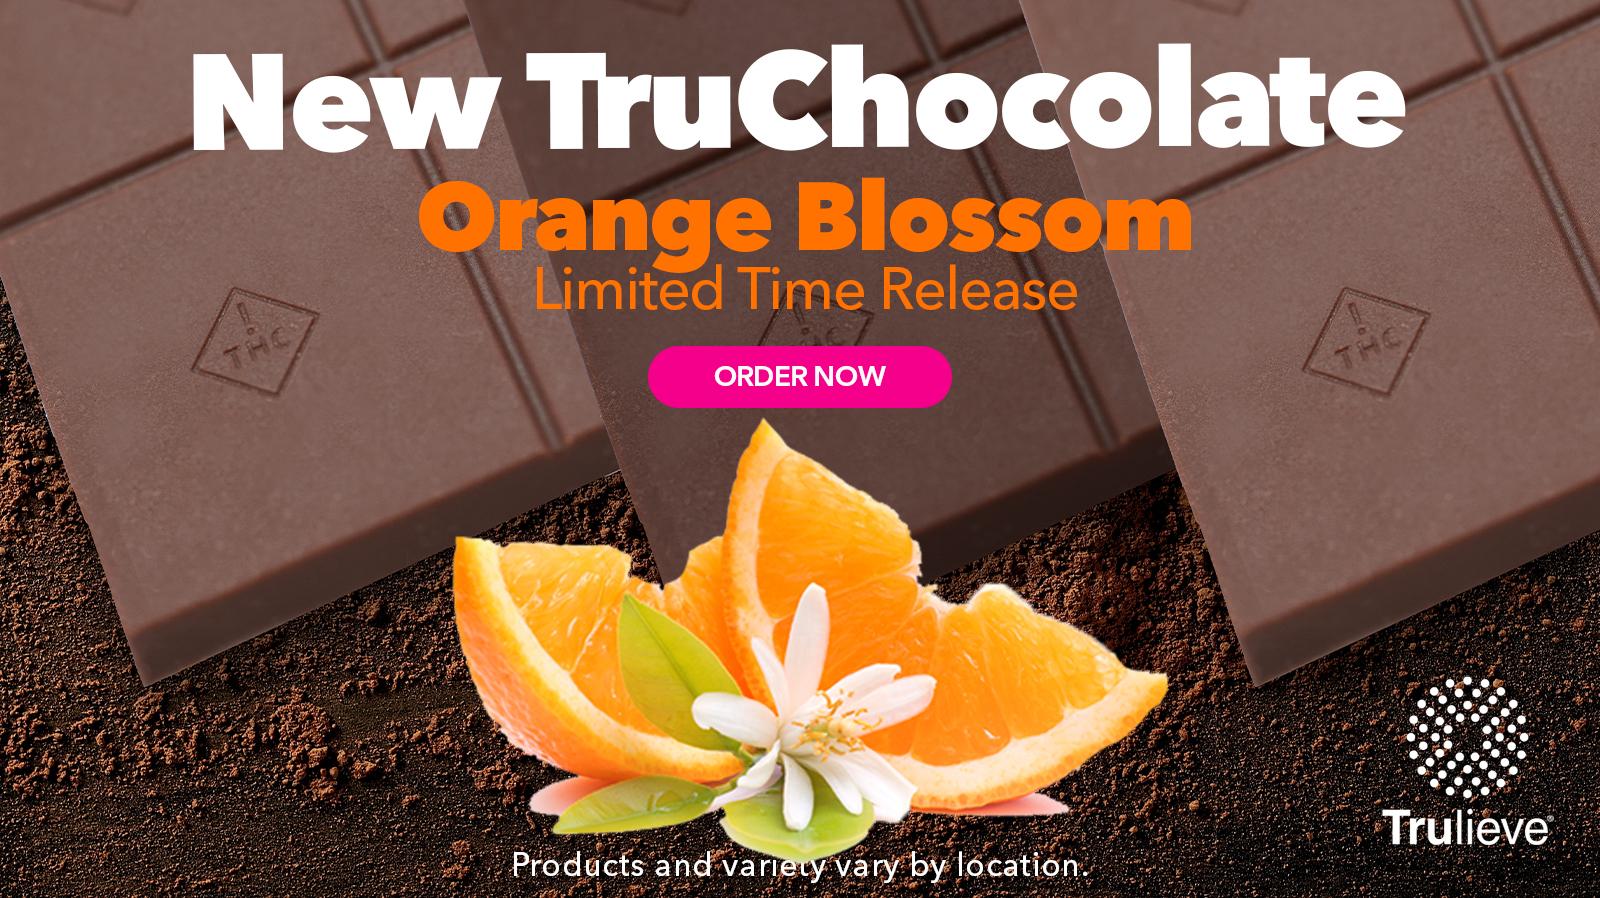 07.26 TruChocolate Orange Blossom